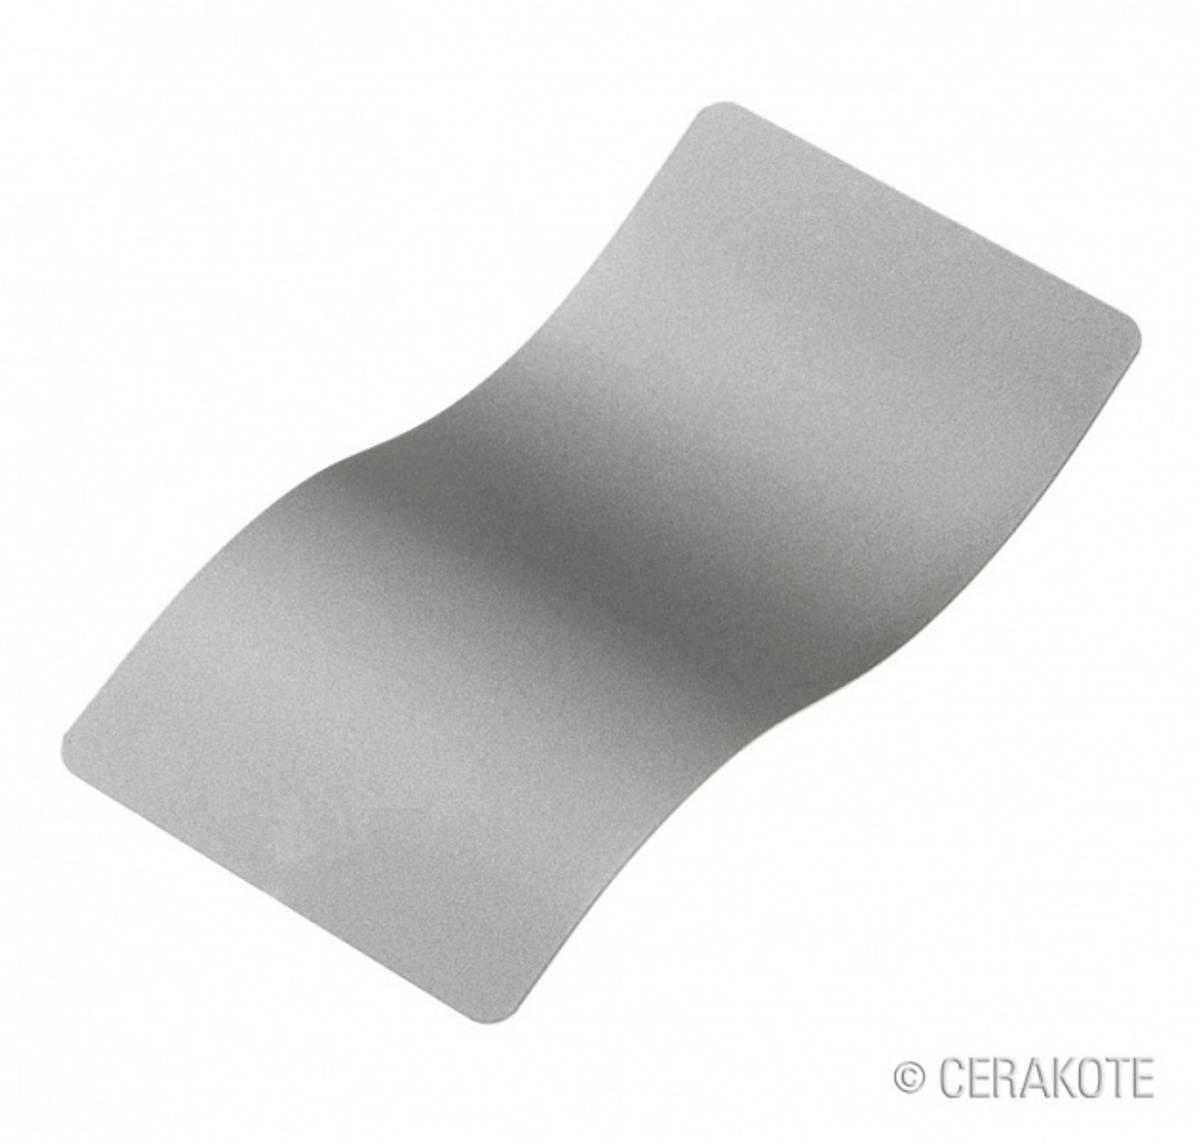 Cerakote C-129 Stainless 120ml